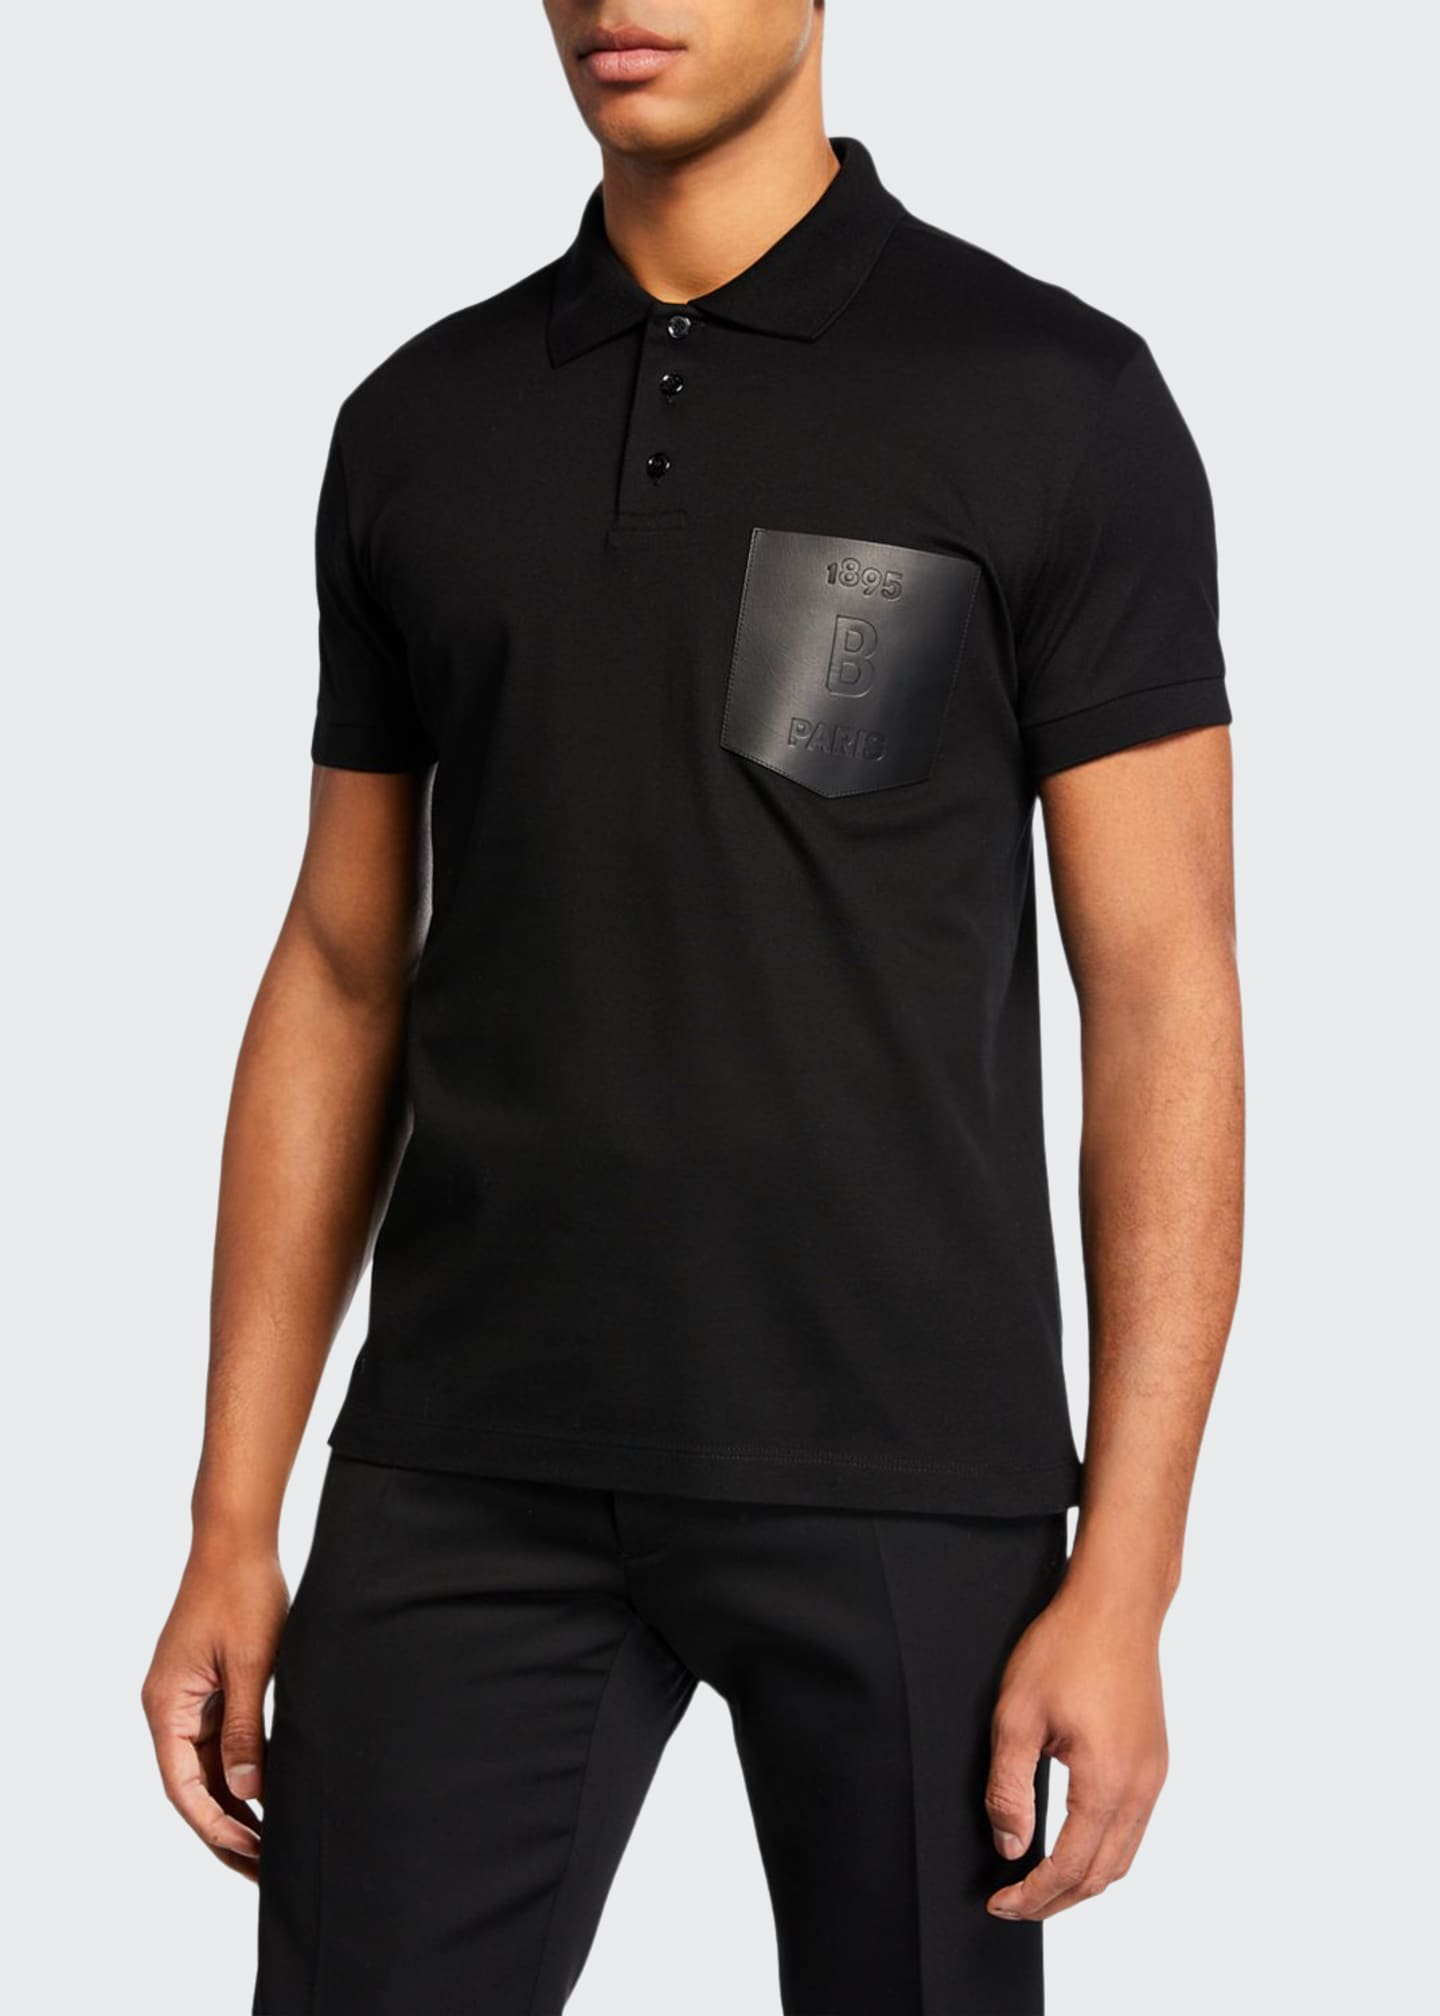 Berluti Men's Leather-Trim Polo Shirt